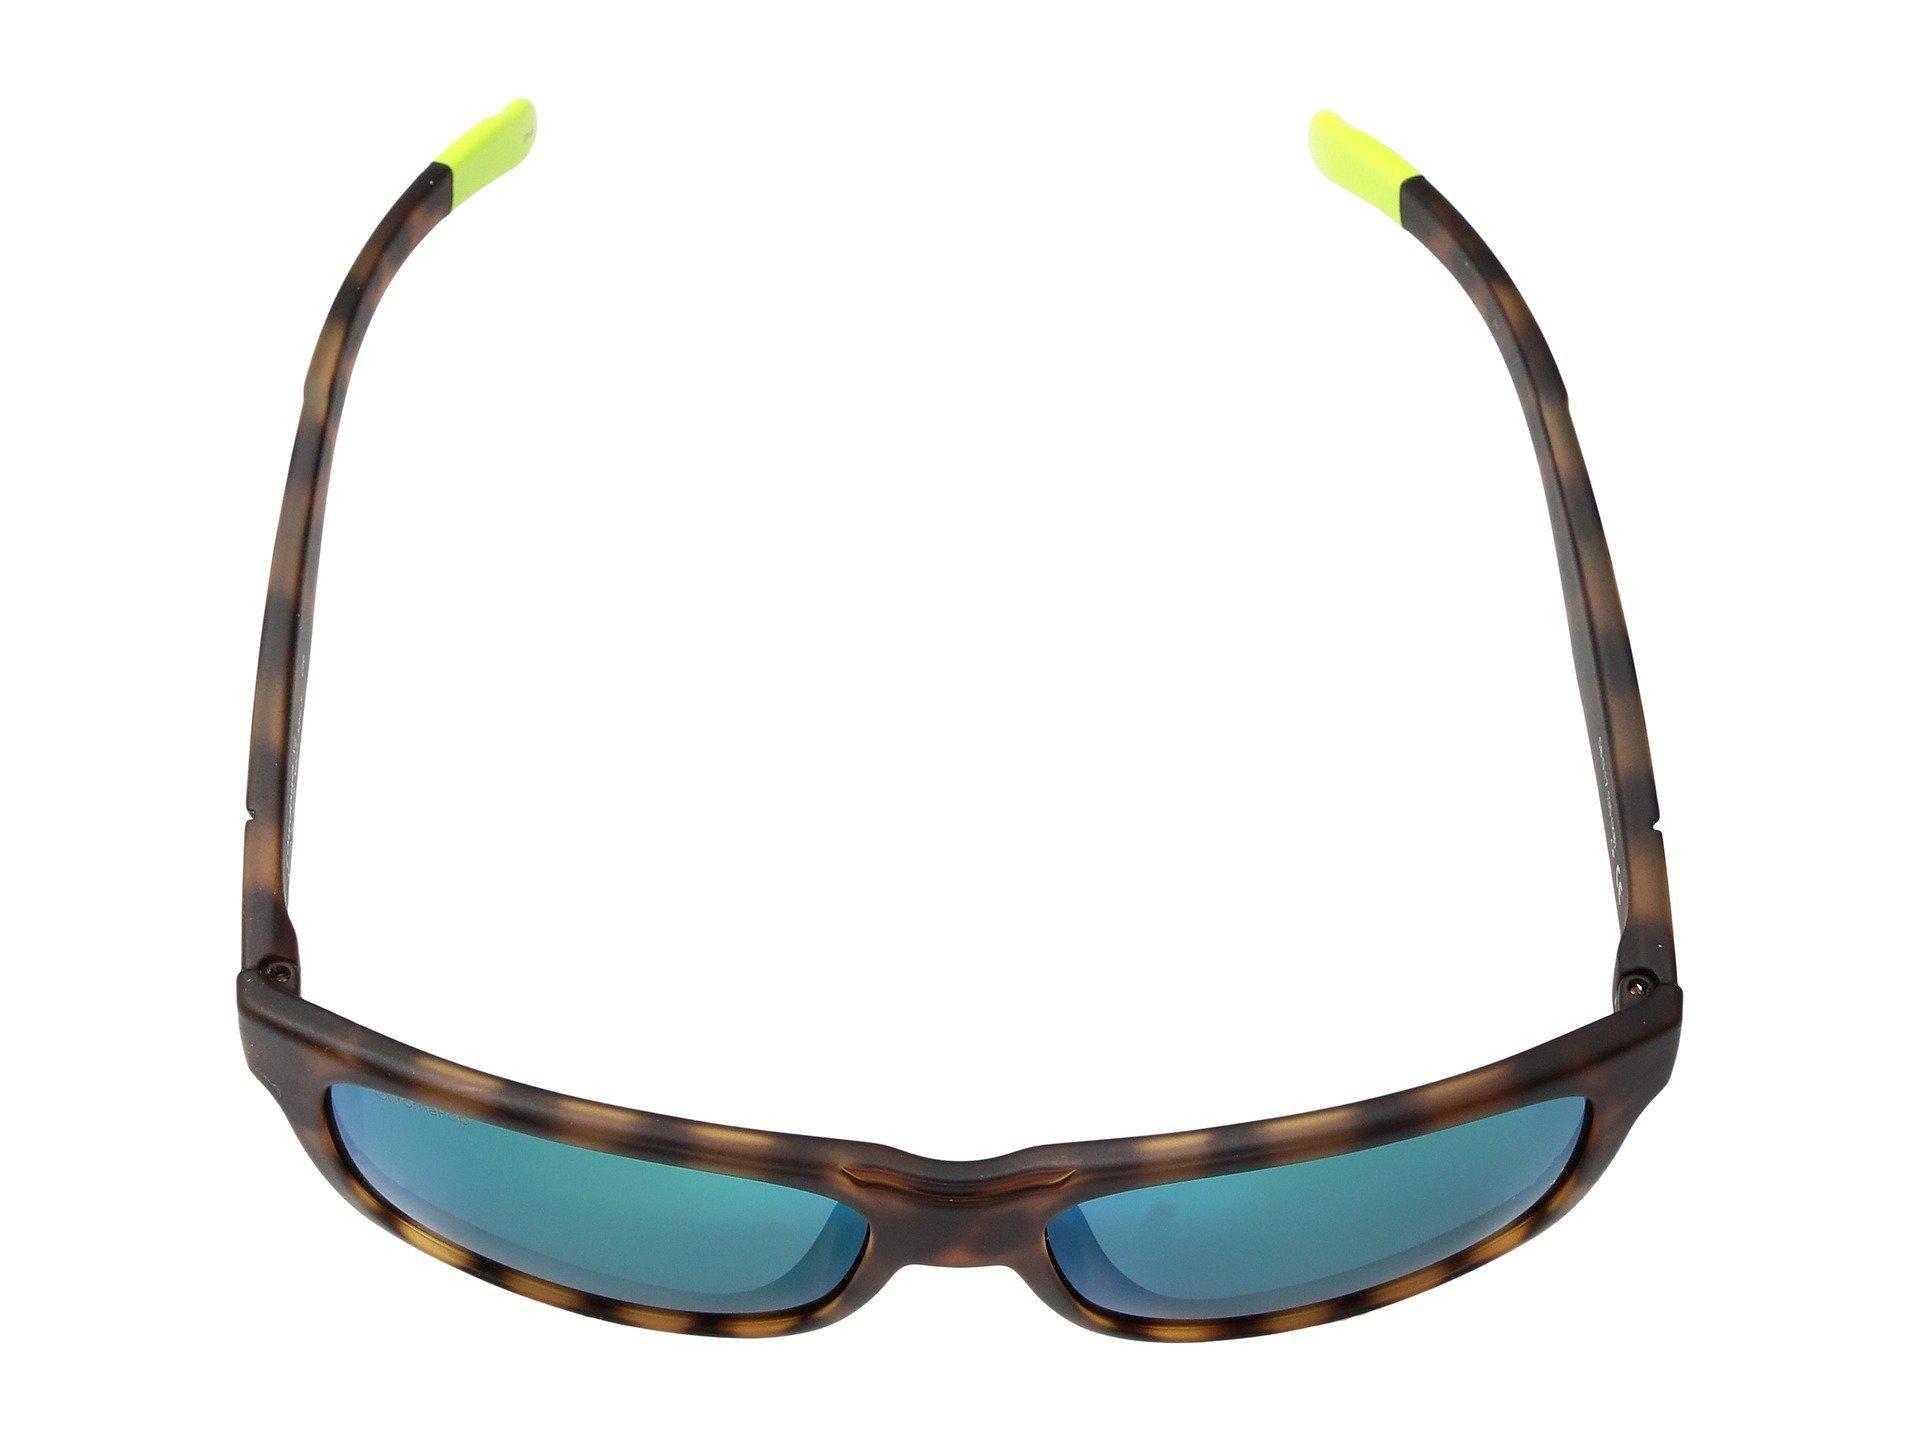 e420dbfaca Smith Optics - Multicolor Lowdown Xl (matte Tortoise Neon chromapop Sun  Green Mirror Lens. View fullscreen